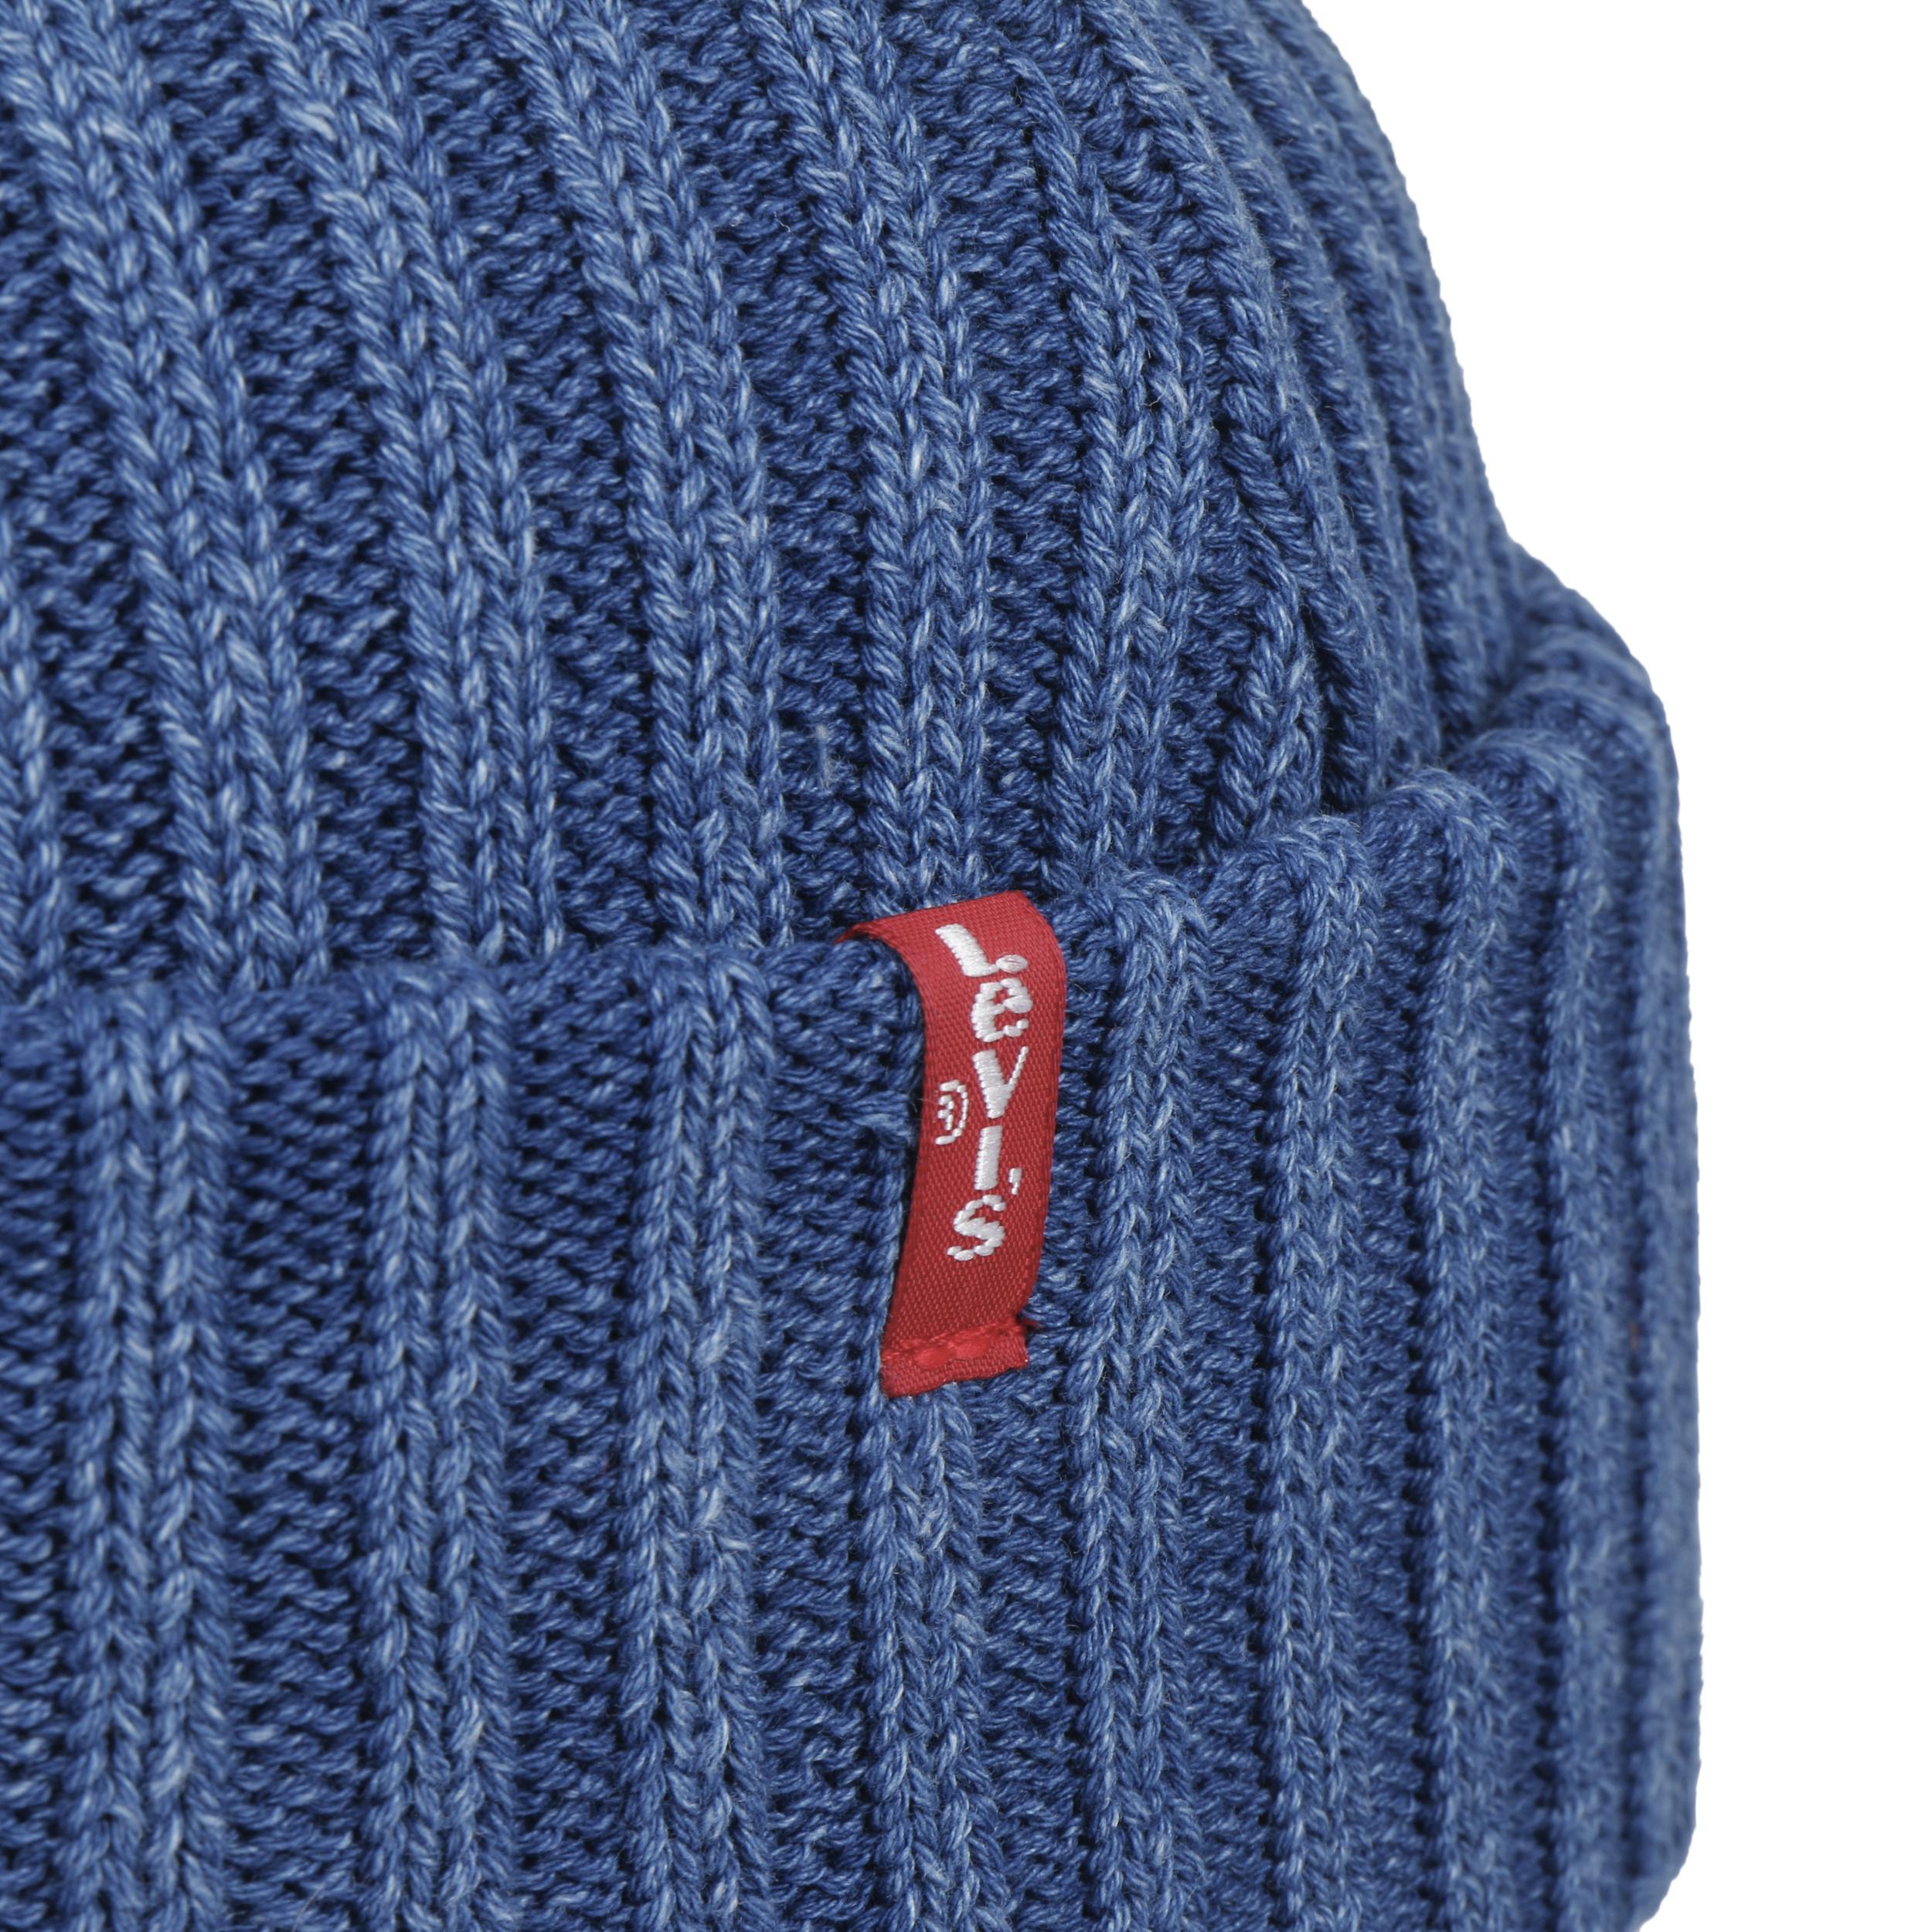 bbd14174cd3 ... Ribbed Indigo Beanie by Levi´s - blue 2 ...